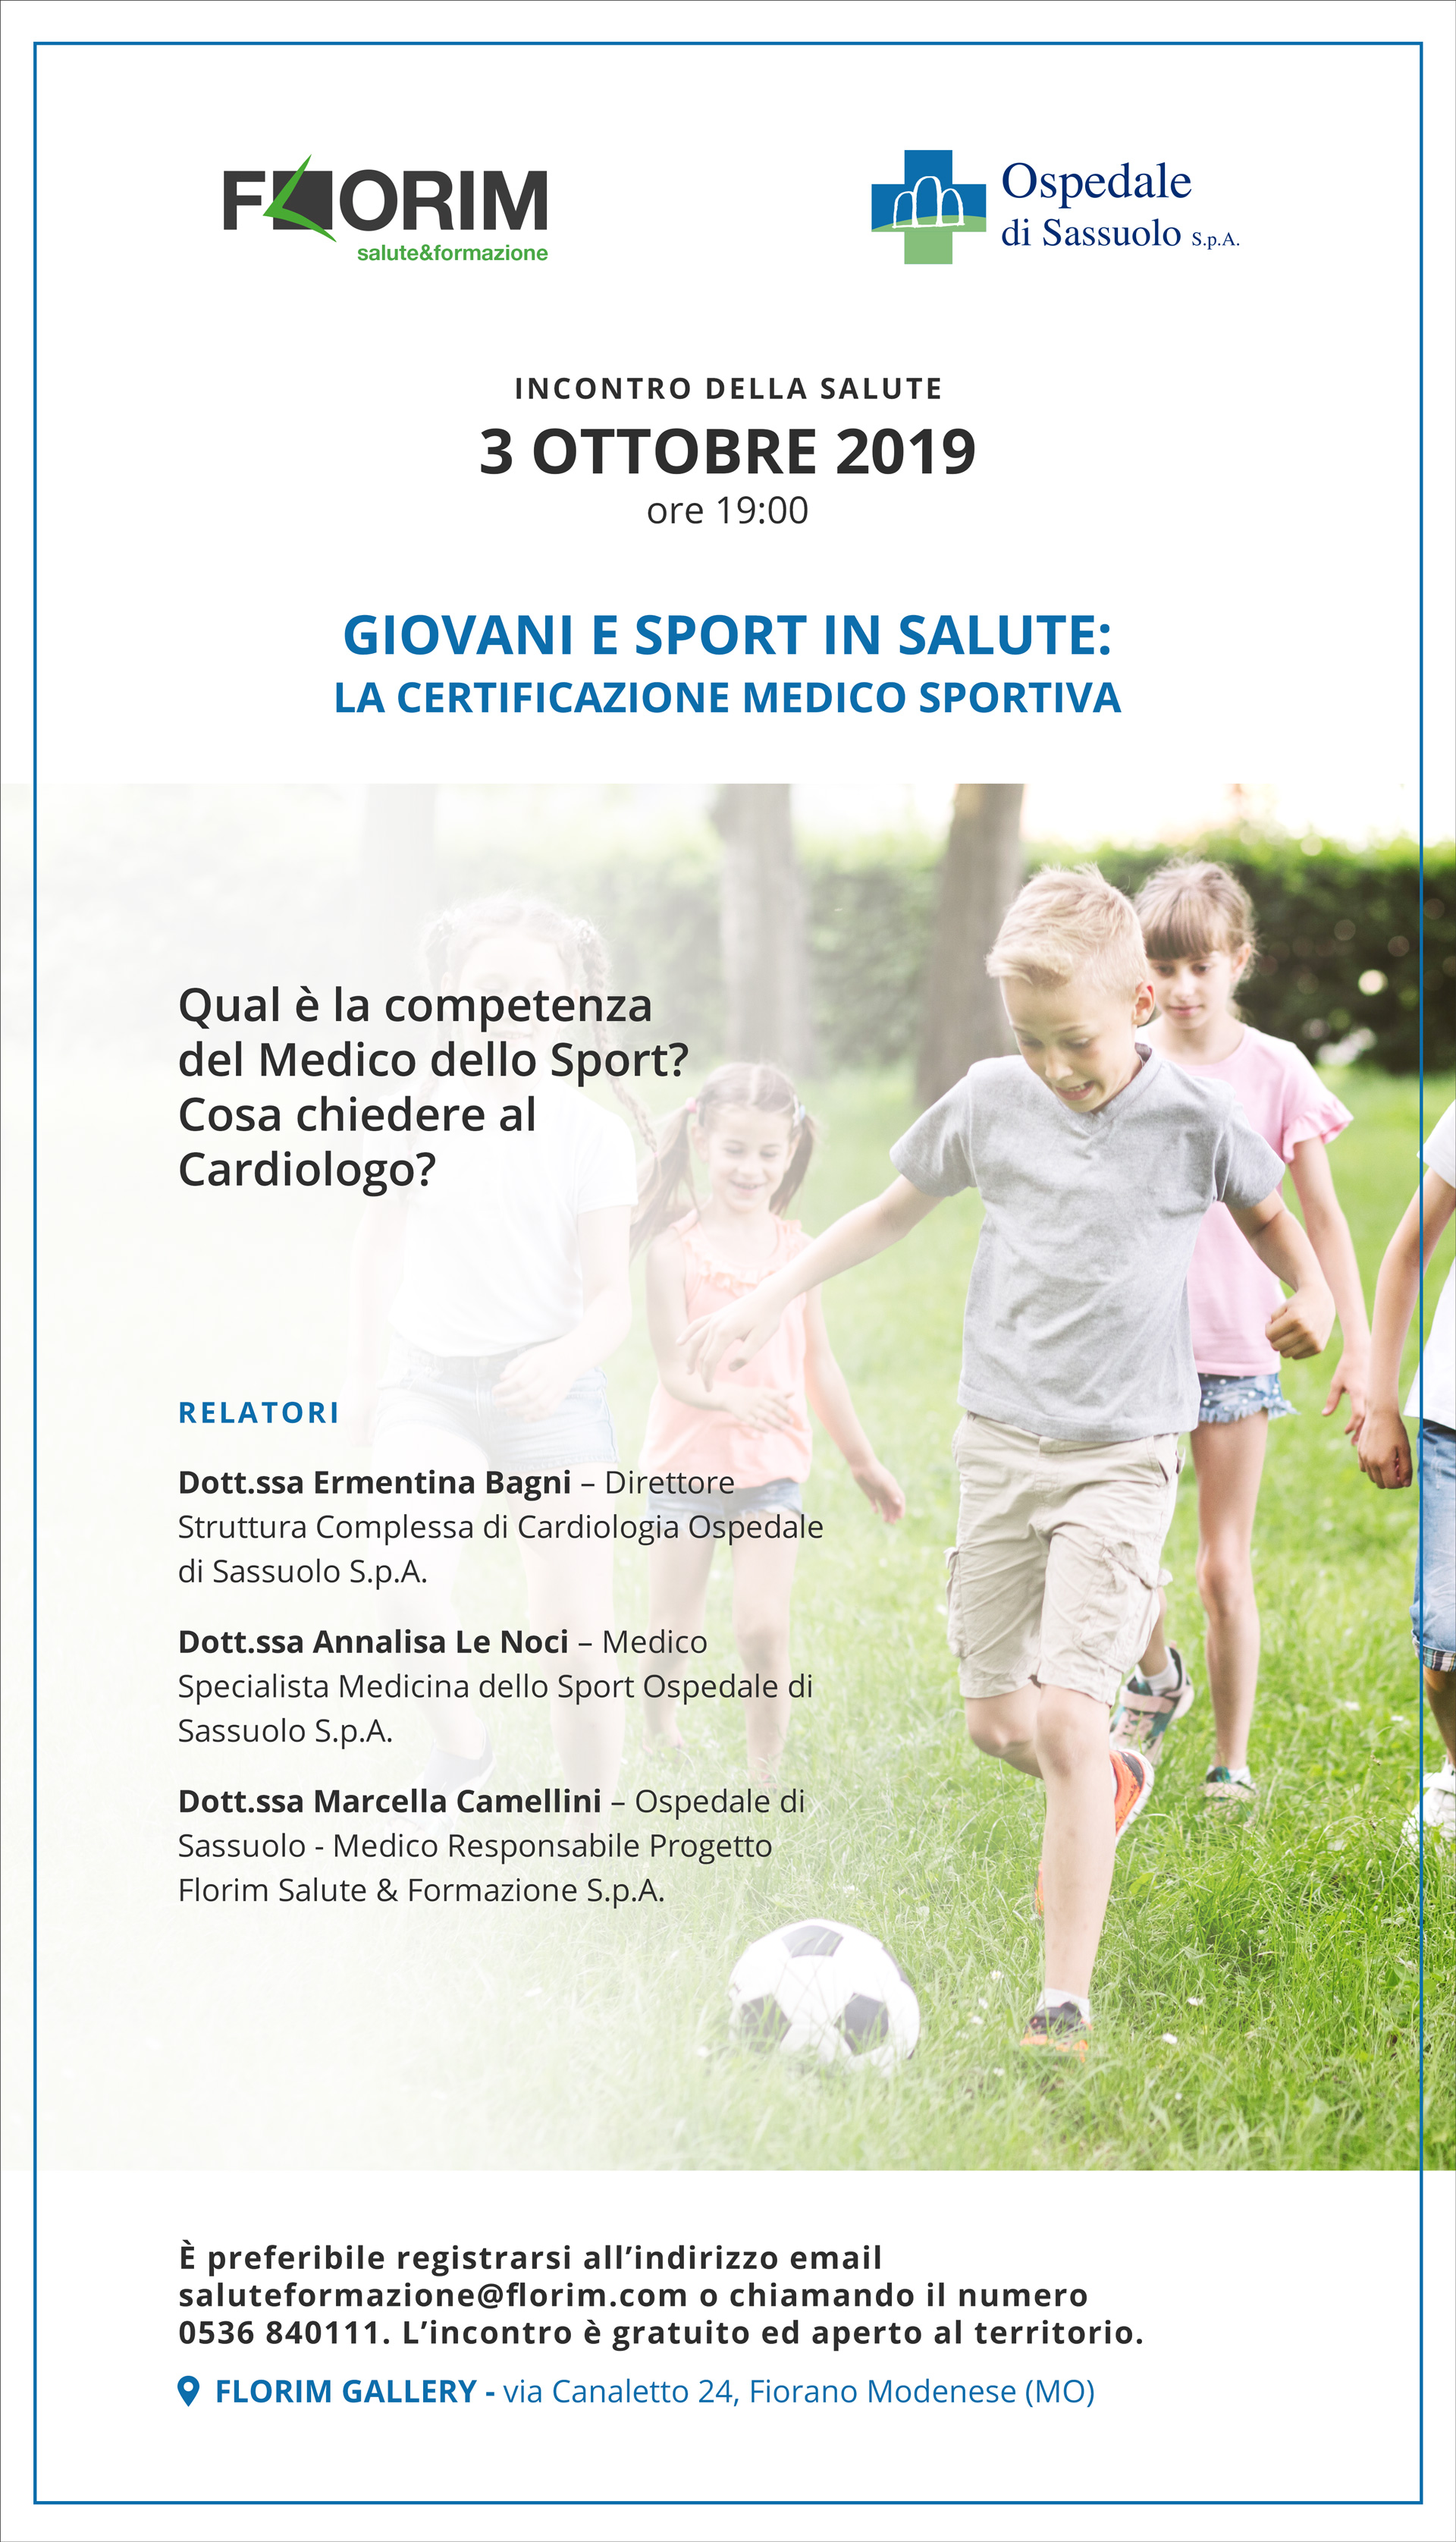 locandina-florim-medicina-sportiva-2019